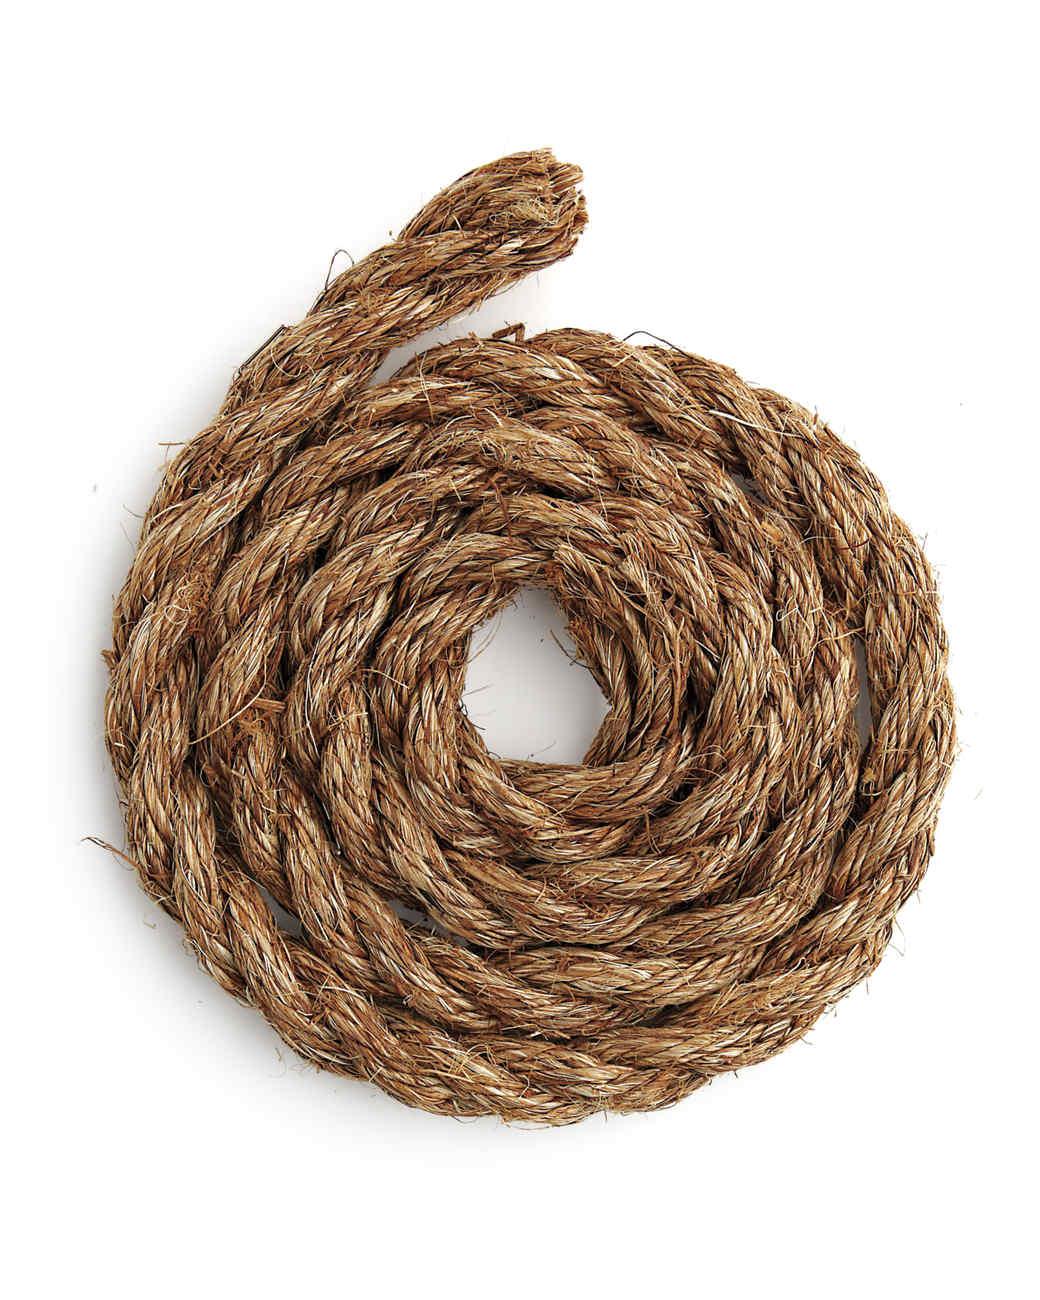 tastemaker-rope-md109288.jpg